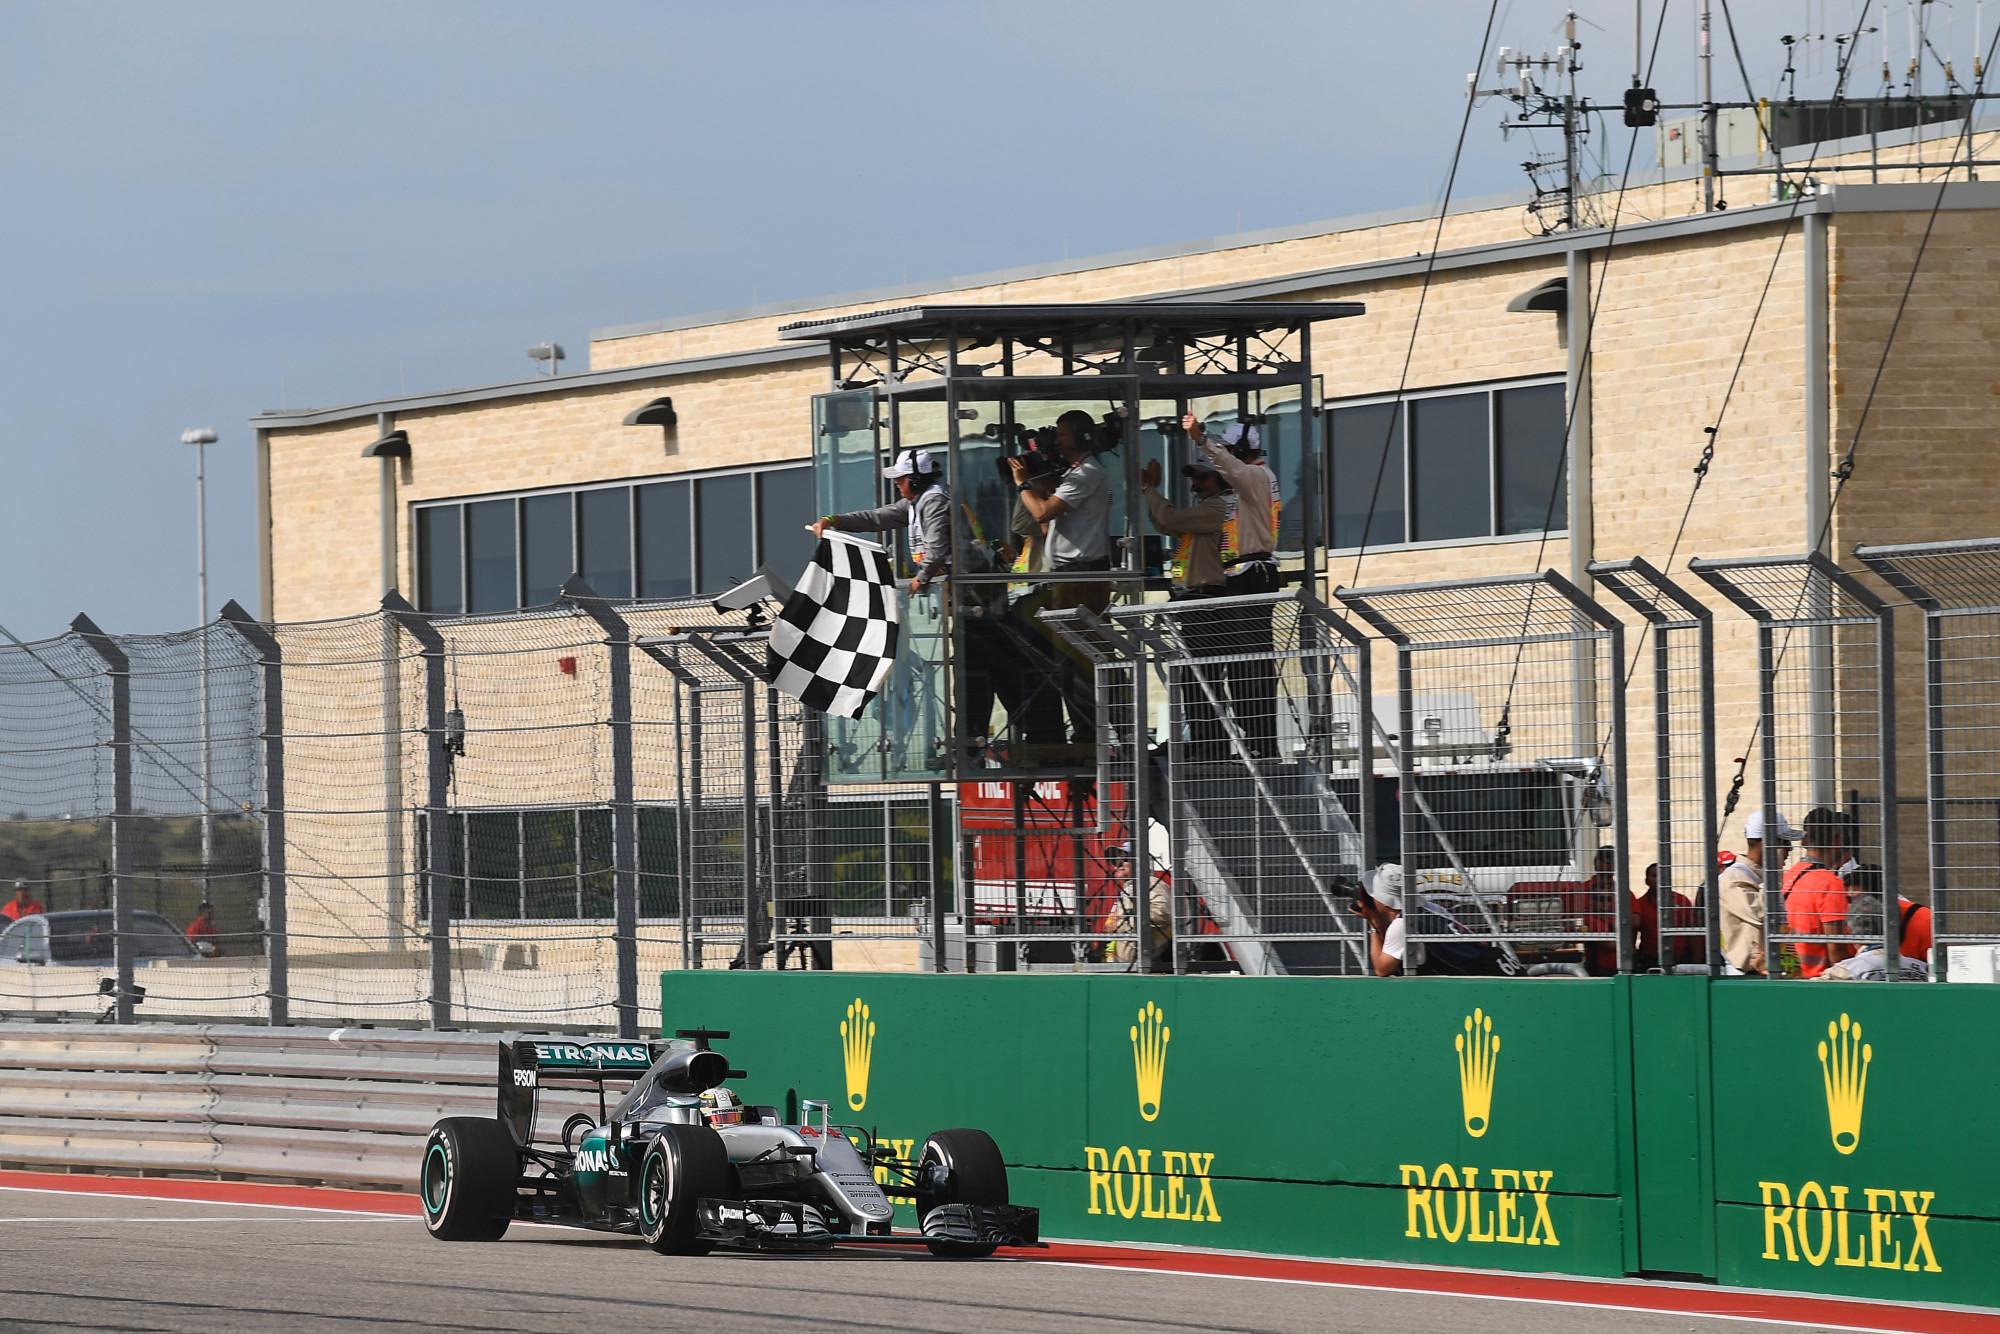 2016 United States Grand Prix